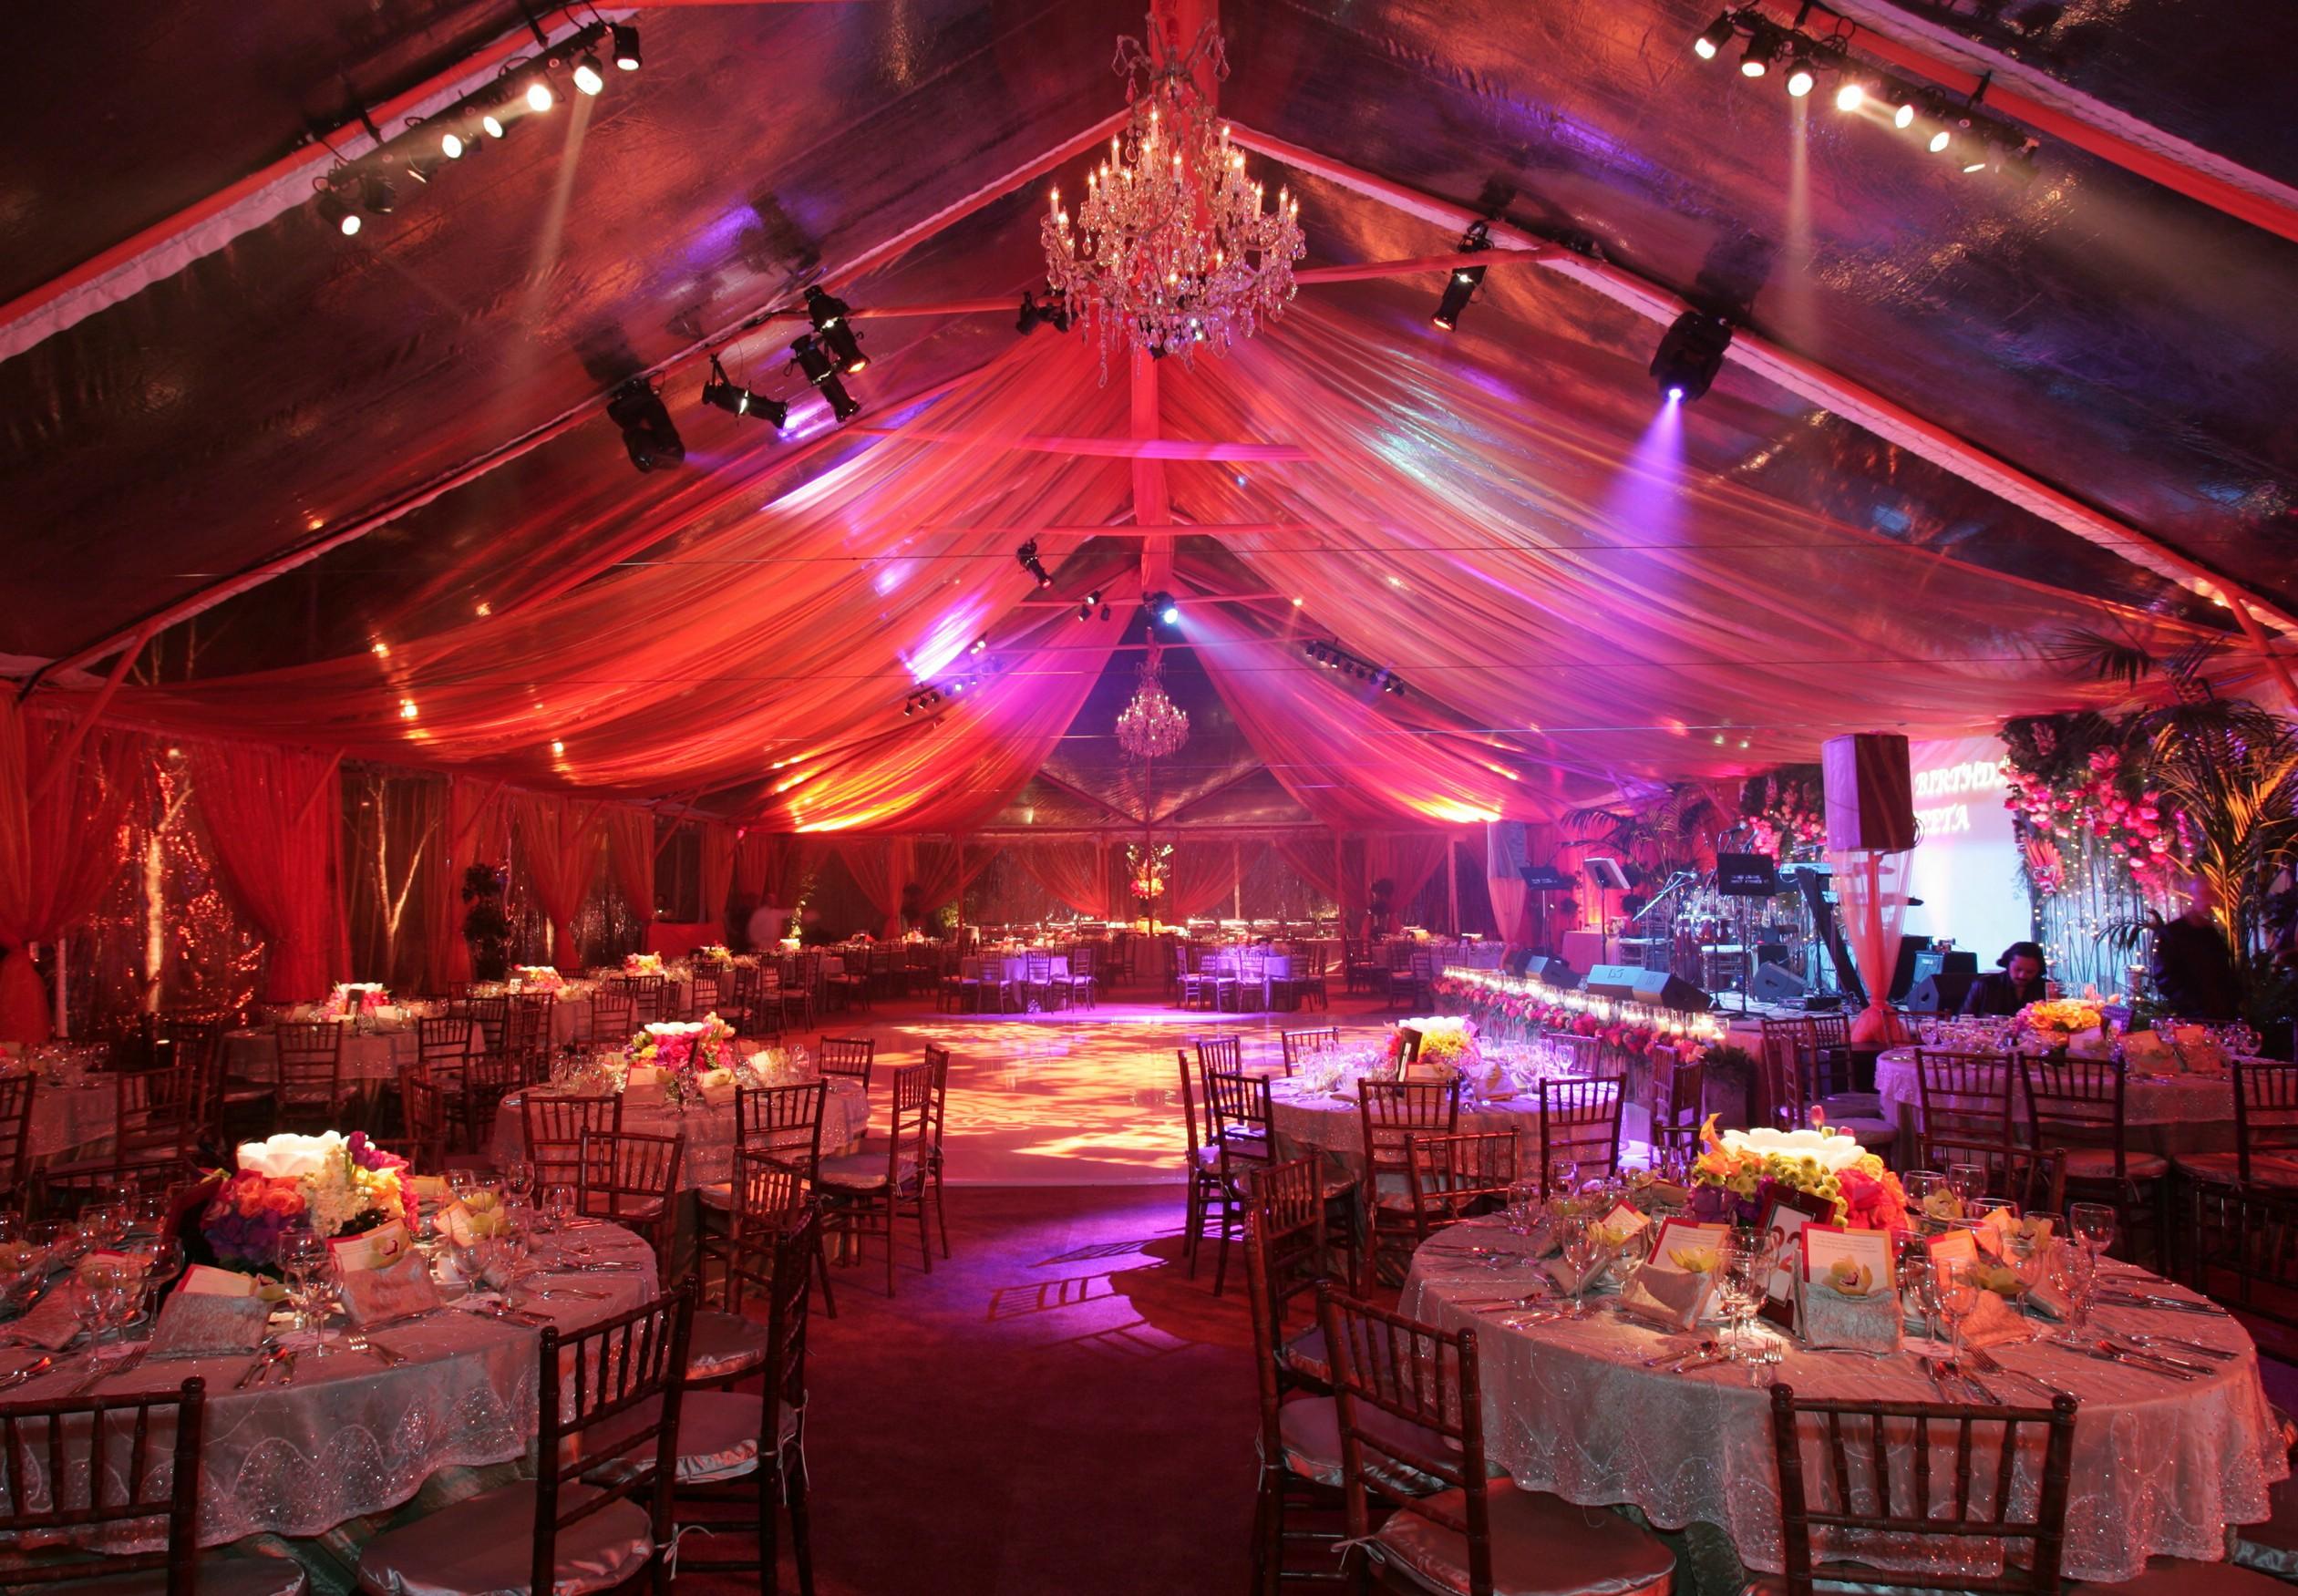 Los Angeles Outdoor Wedding Venue | MountainGate Country Club